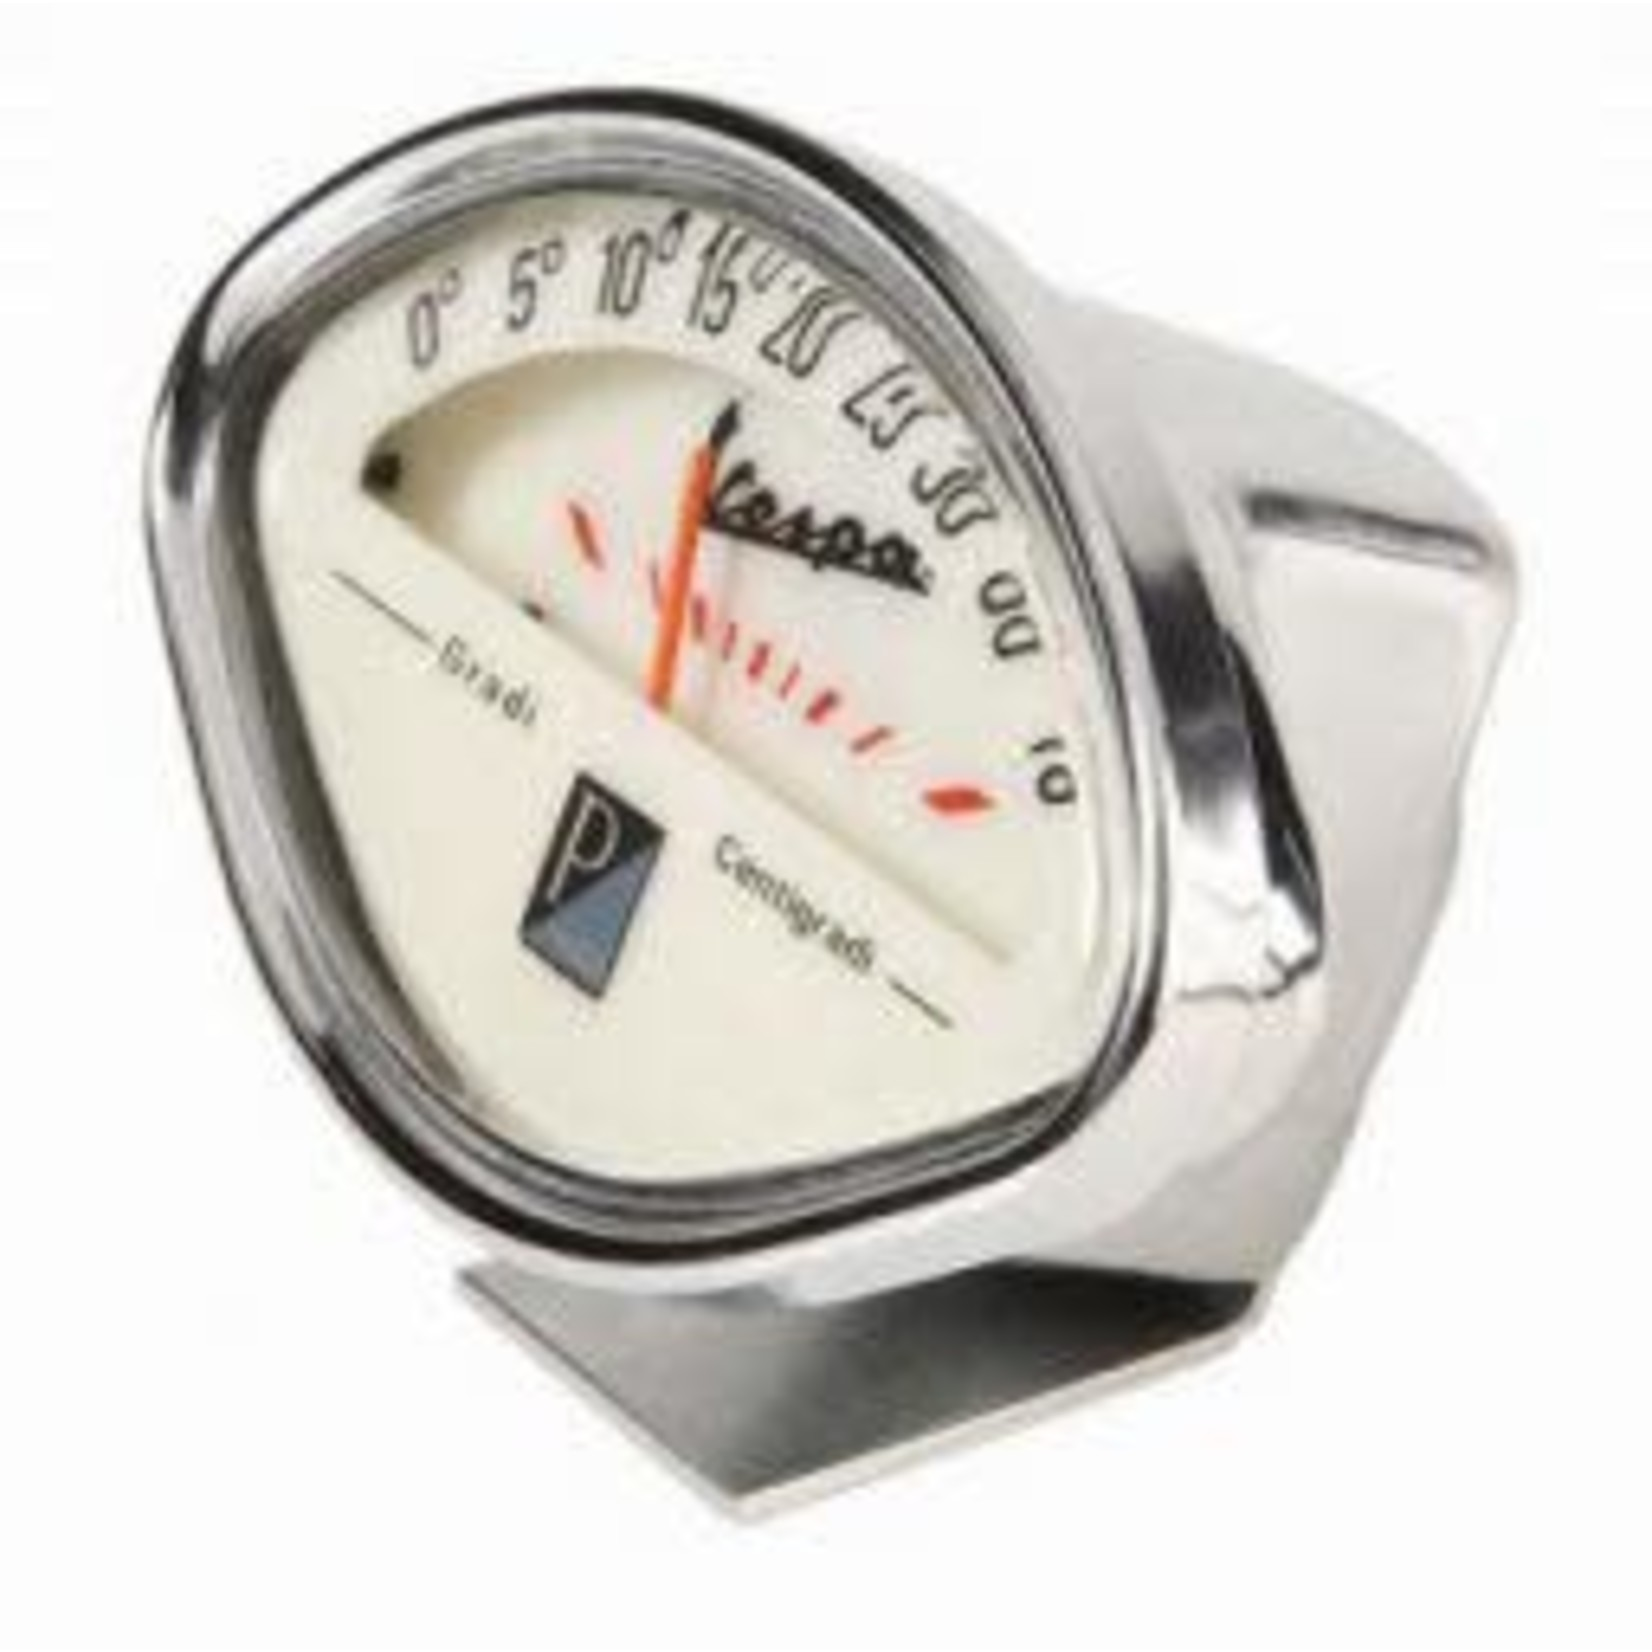 Lifestyle Thermometer, Vespa Speedo Gift Set